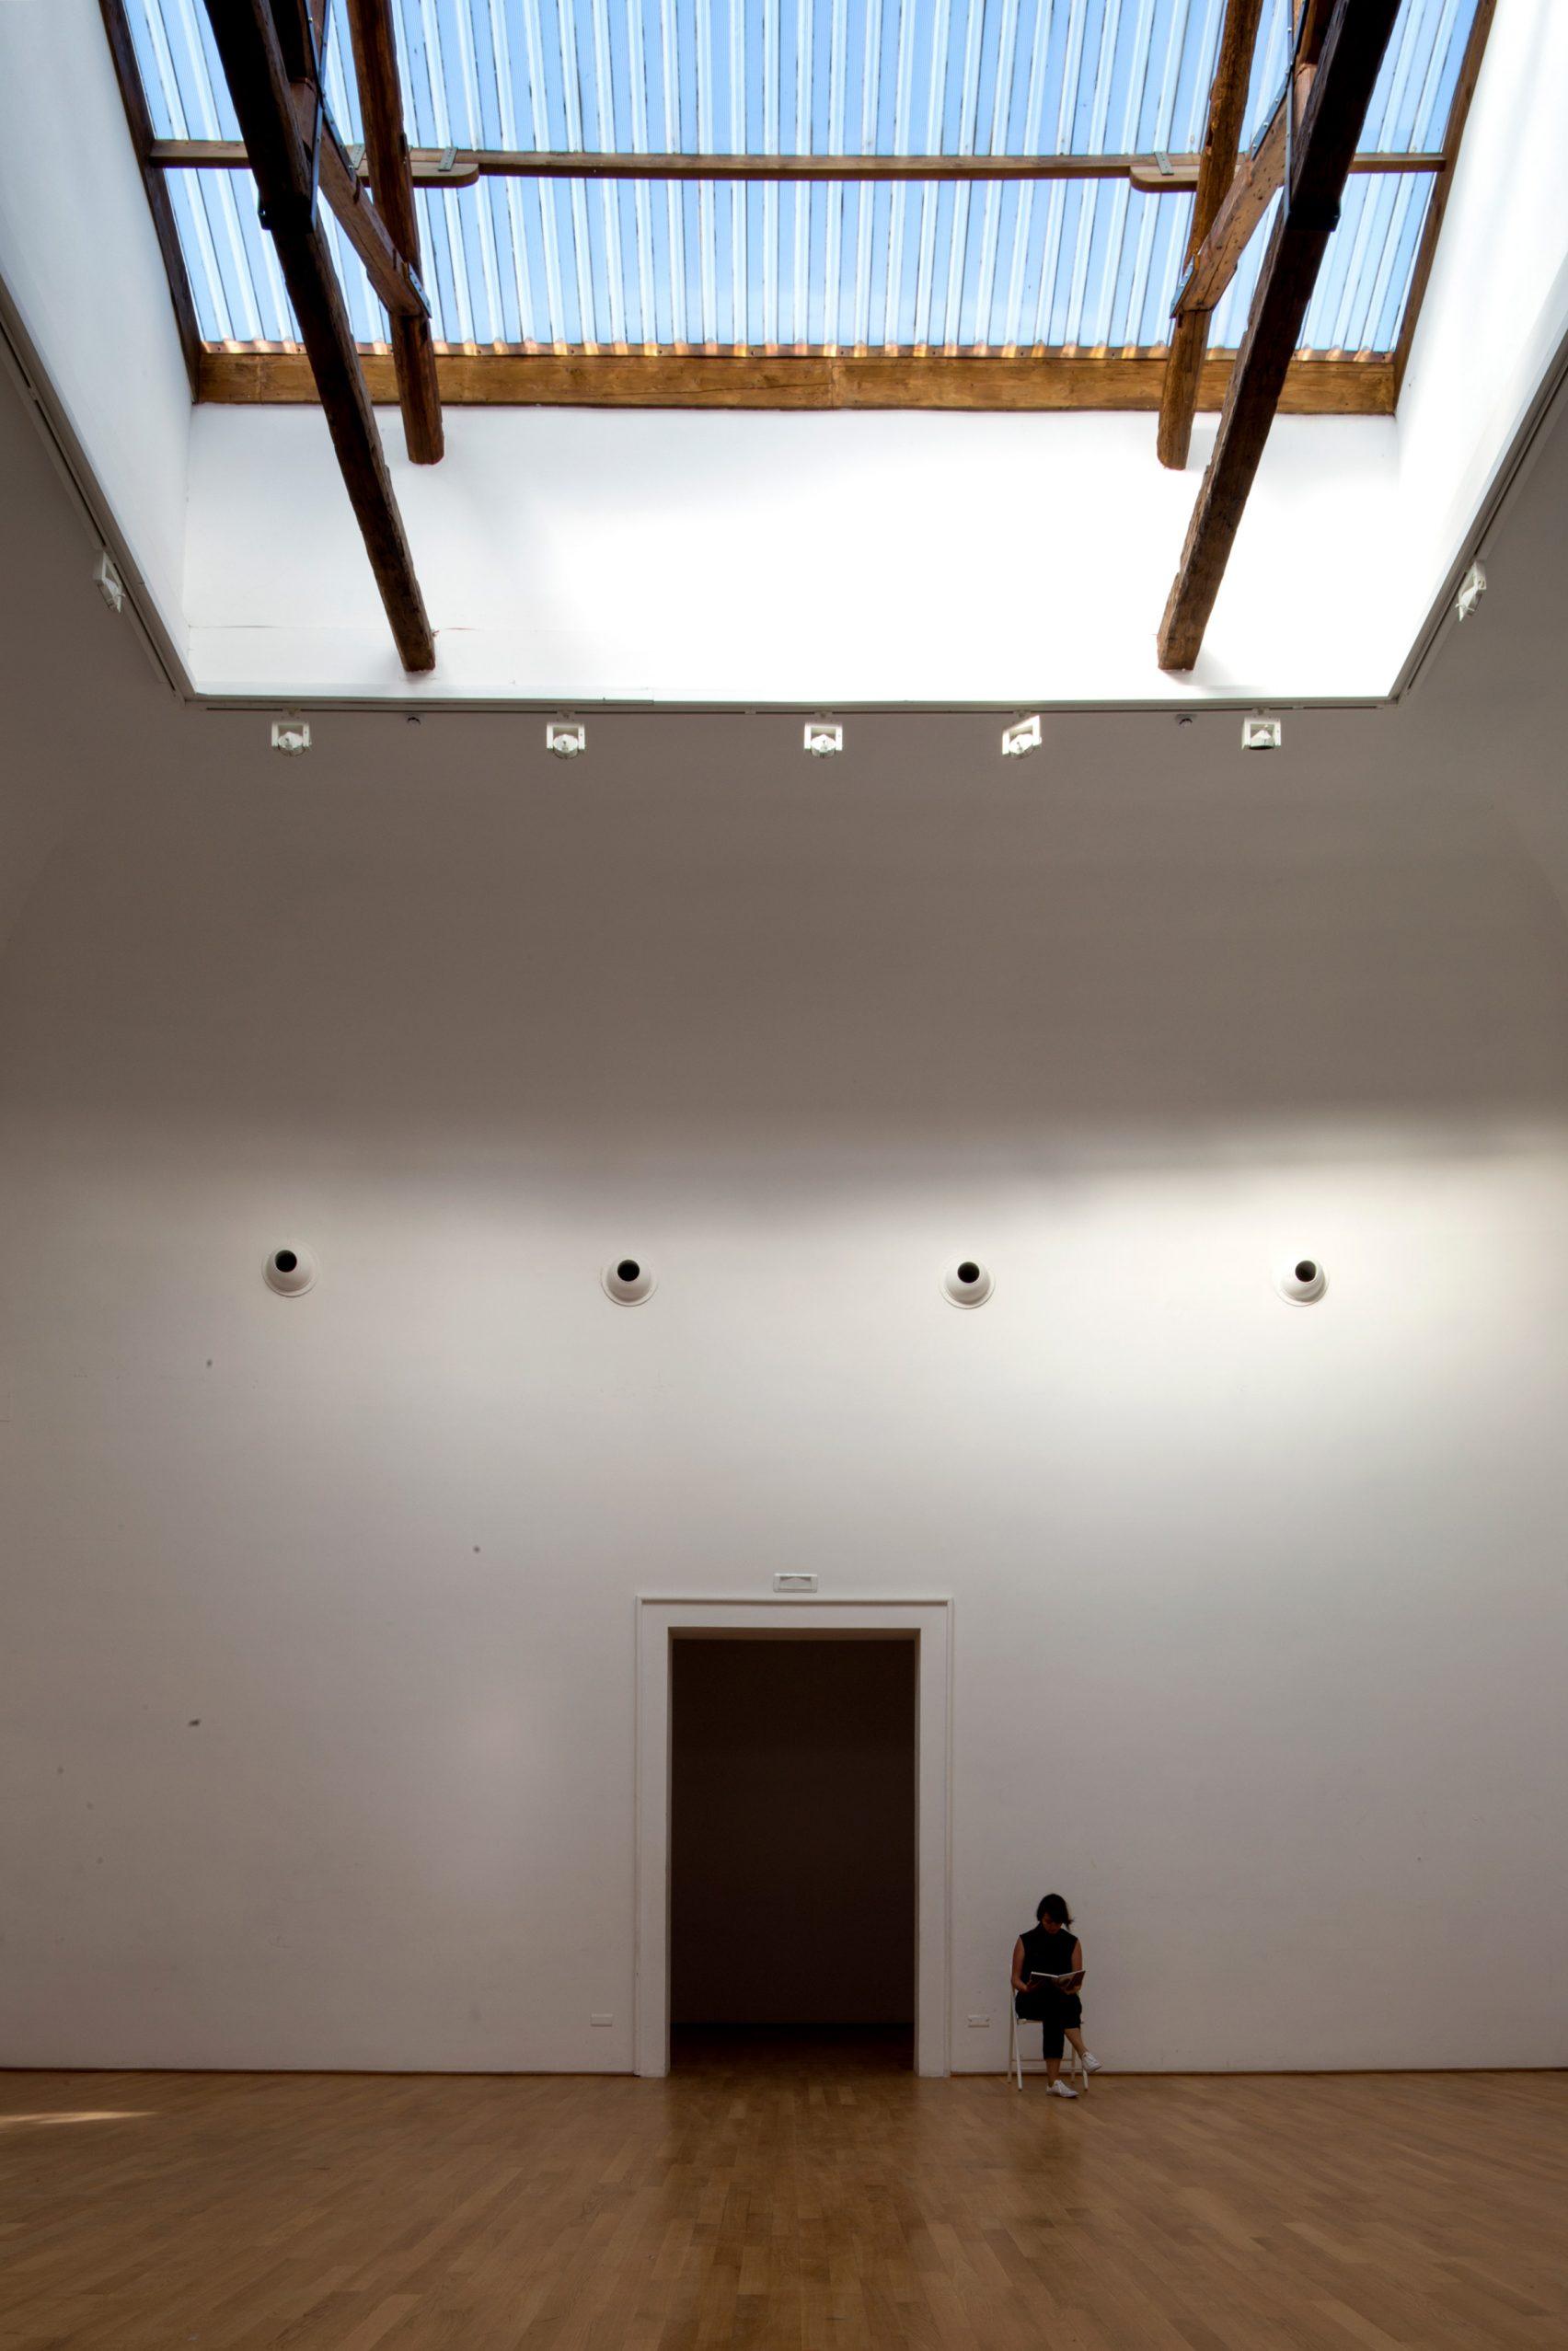 island-gran-bretana-bienal-venecia-Caruso-St-John-Helene-Binet -03